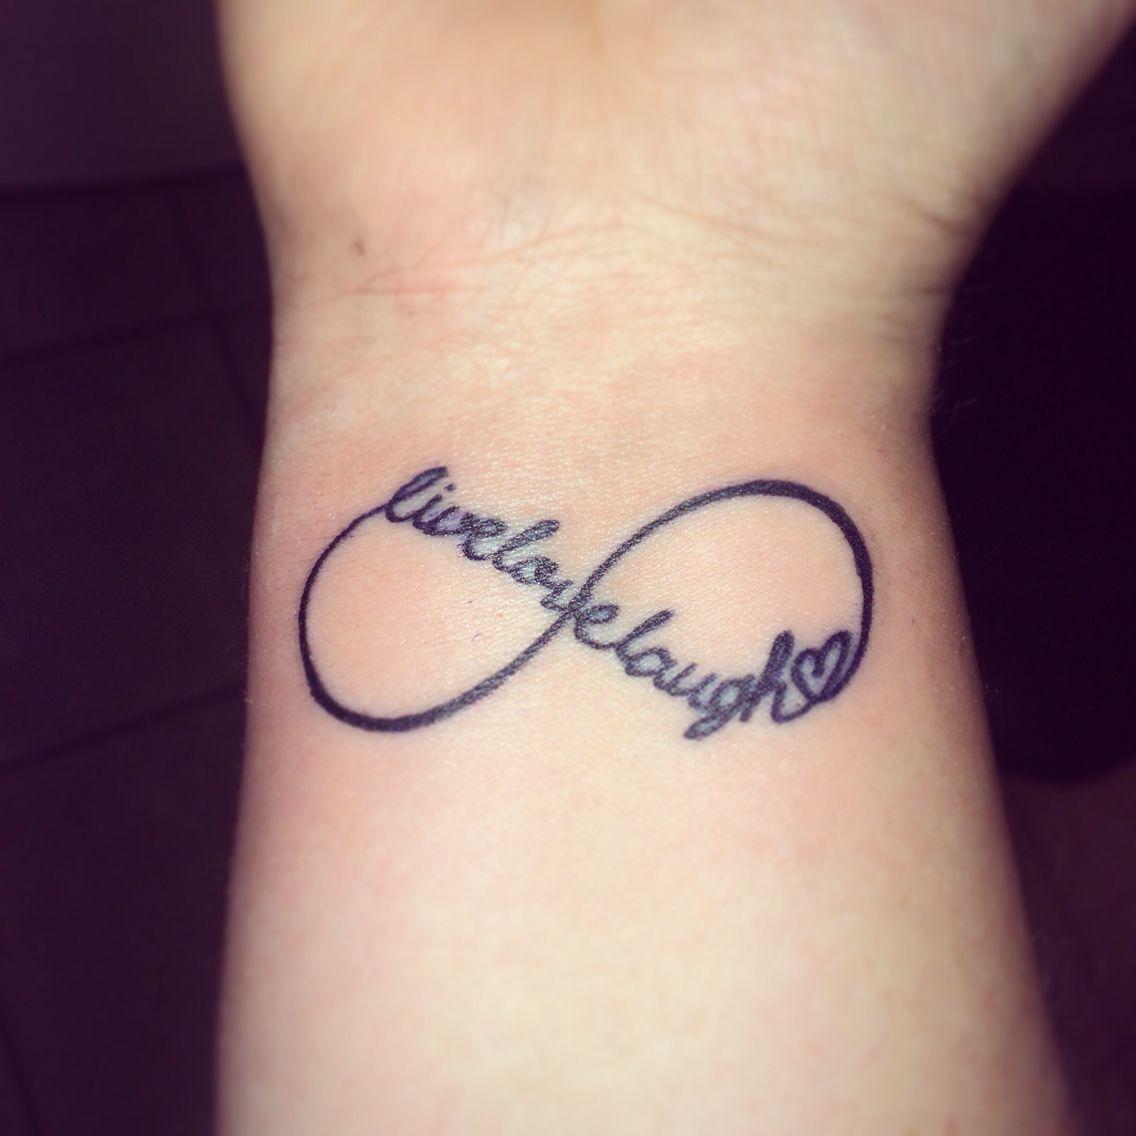 Tattoo Live Love Laugh Infinity Inspirational Tattoos Infinity Tattoos Pink Ribbon Tattoos